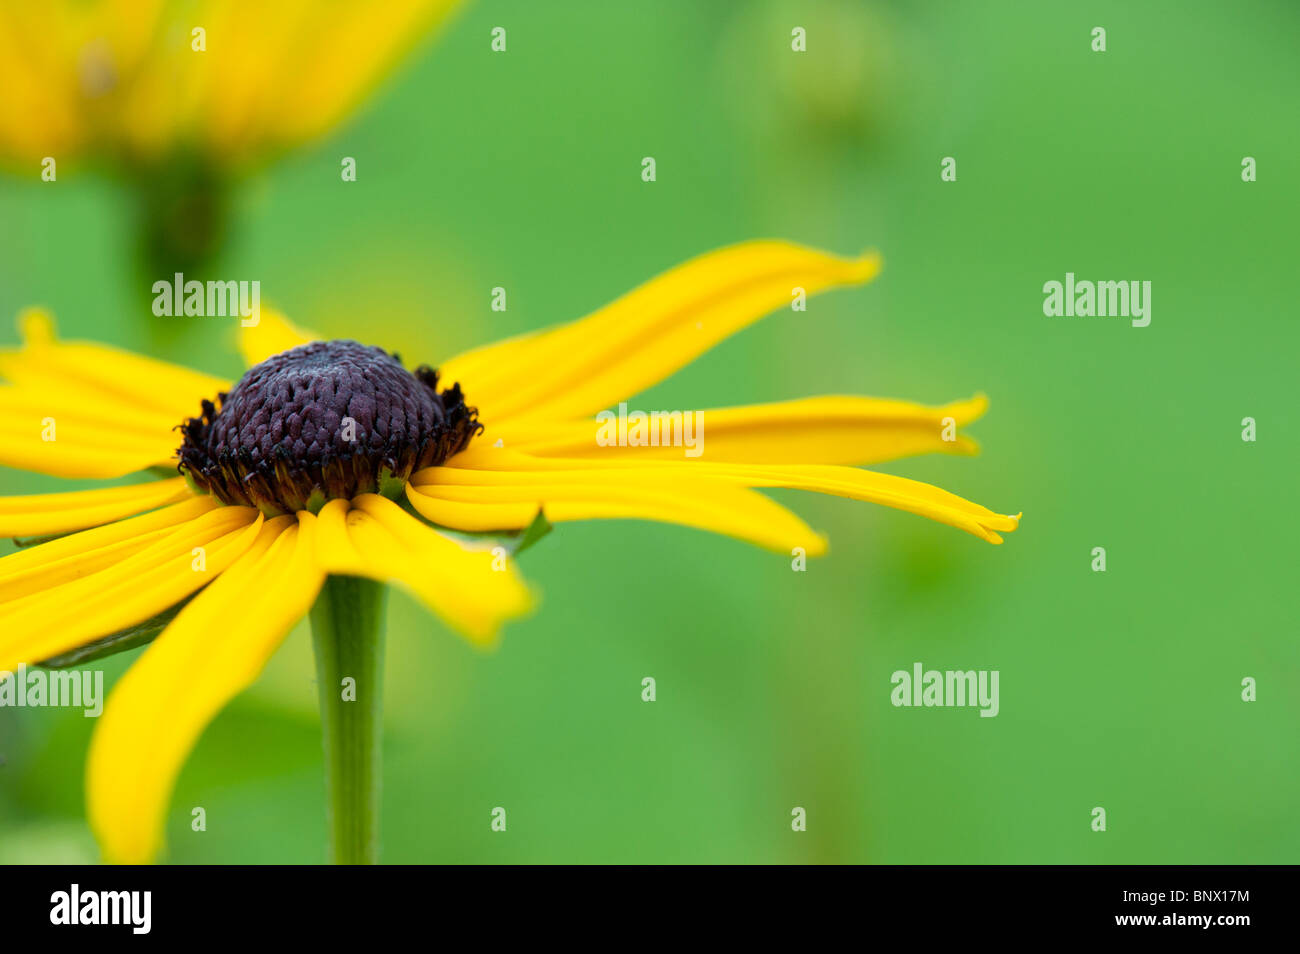 Rudbeckia fulgida var sullivantii 'Goldsturm'. Black Eyed Susan flower Stock Photo